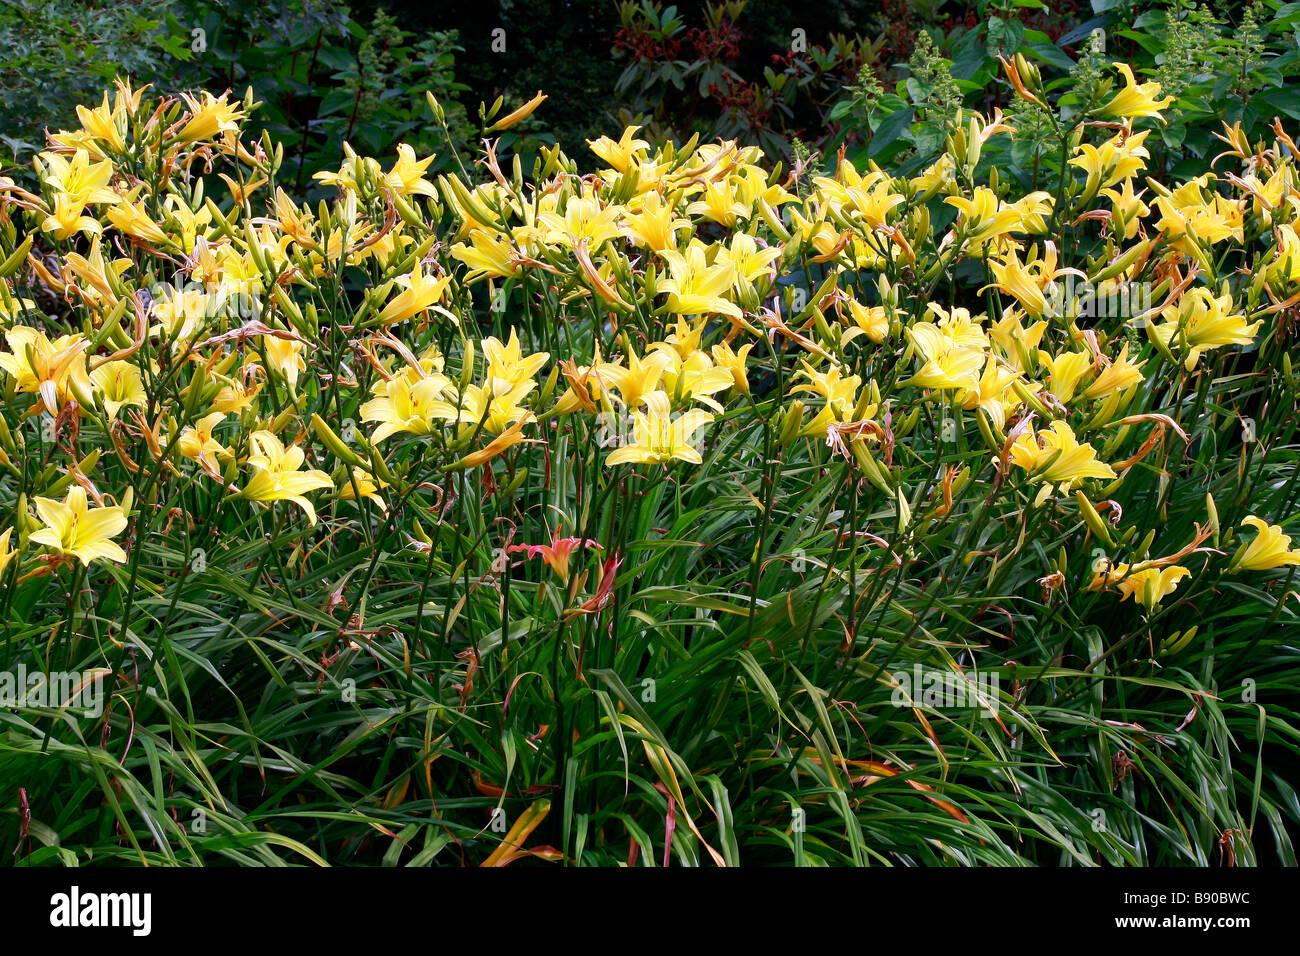 Hemerocallis Marion Vaughn - Stock Image